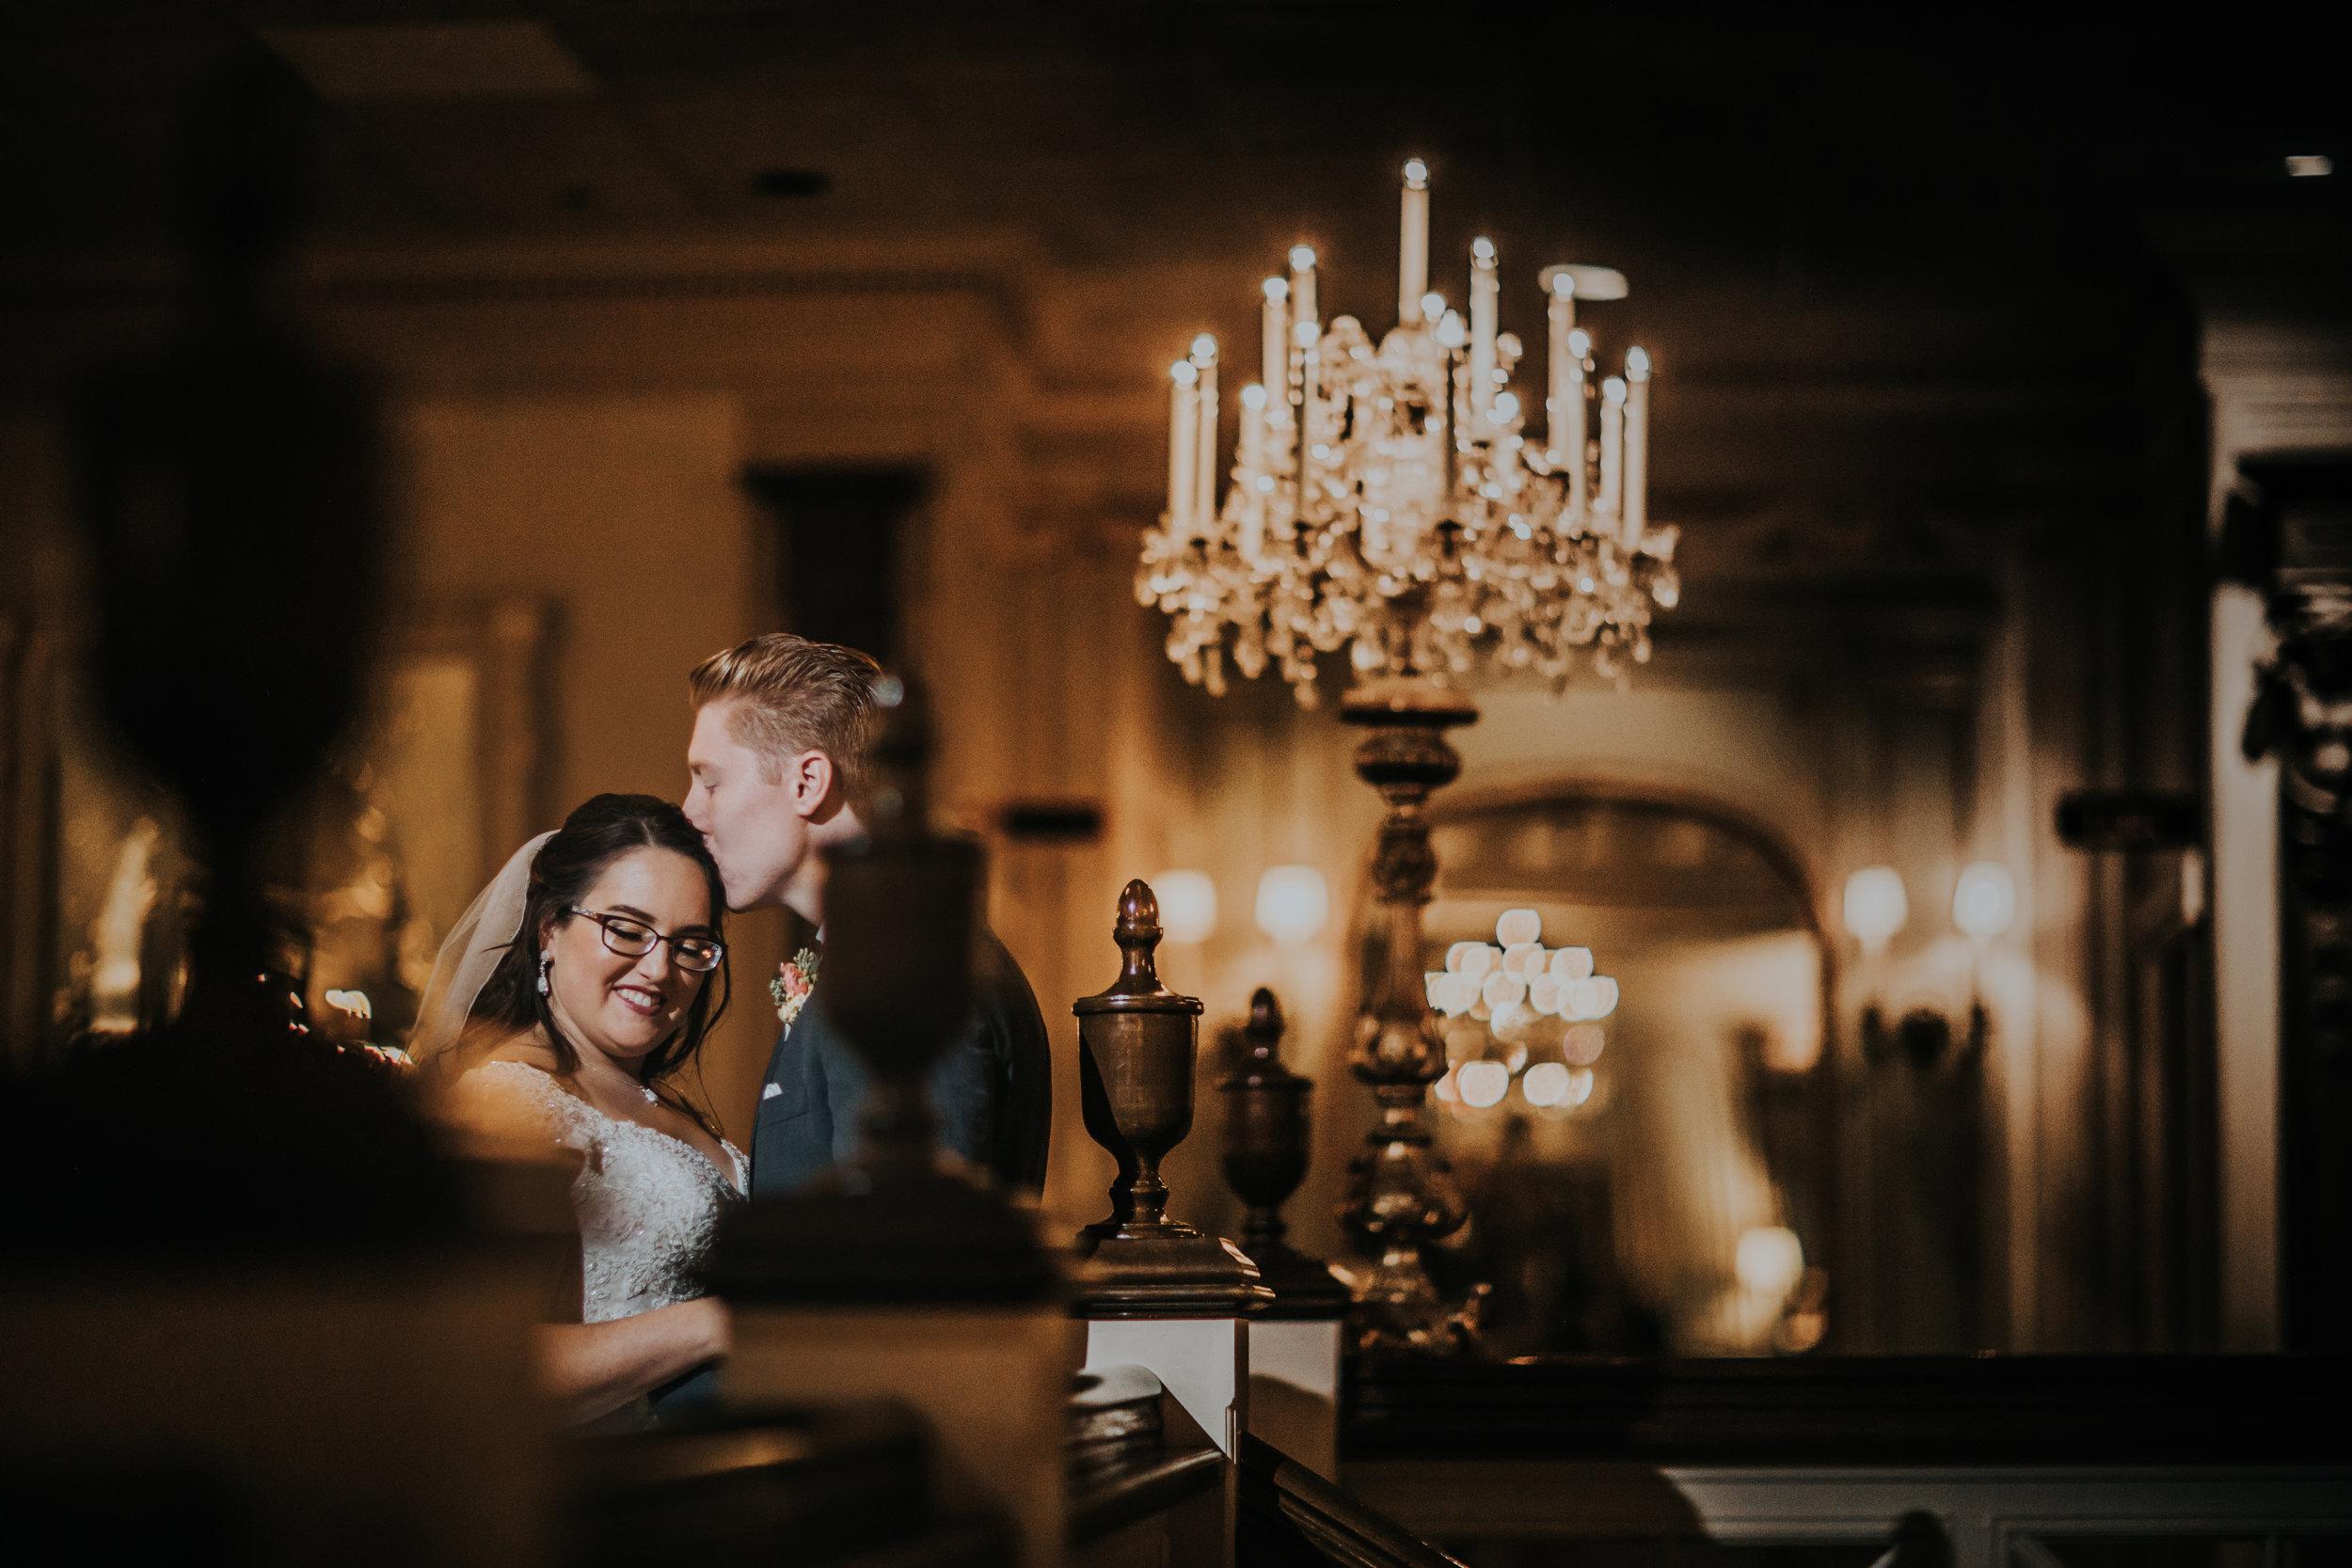 New-Jersey-Wedding-Photography-Fishers-Tudor-House-JennaLynnPhotography-Bride&Groom-Kathleen&Eddie-26.jpg